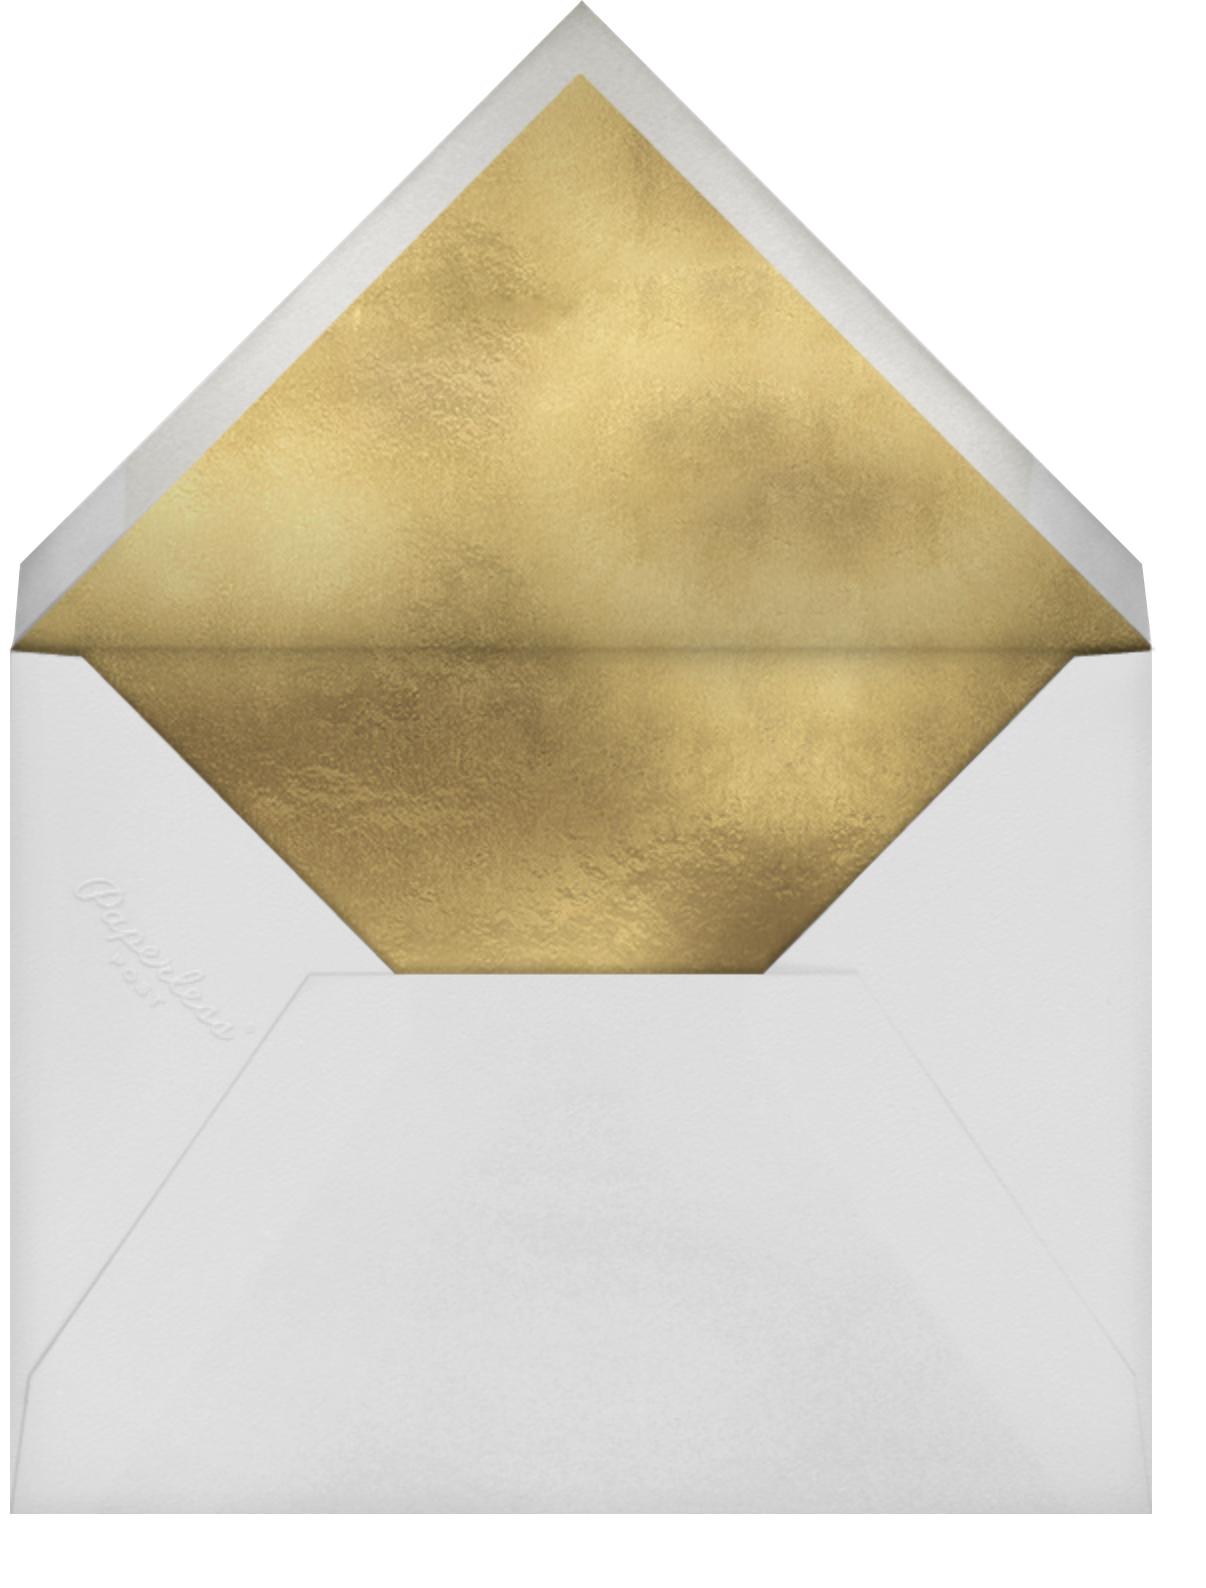 Sealed Lips Photo - Black - kate spade new york - Envelope